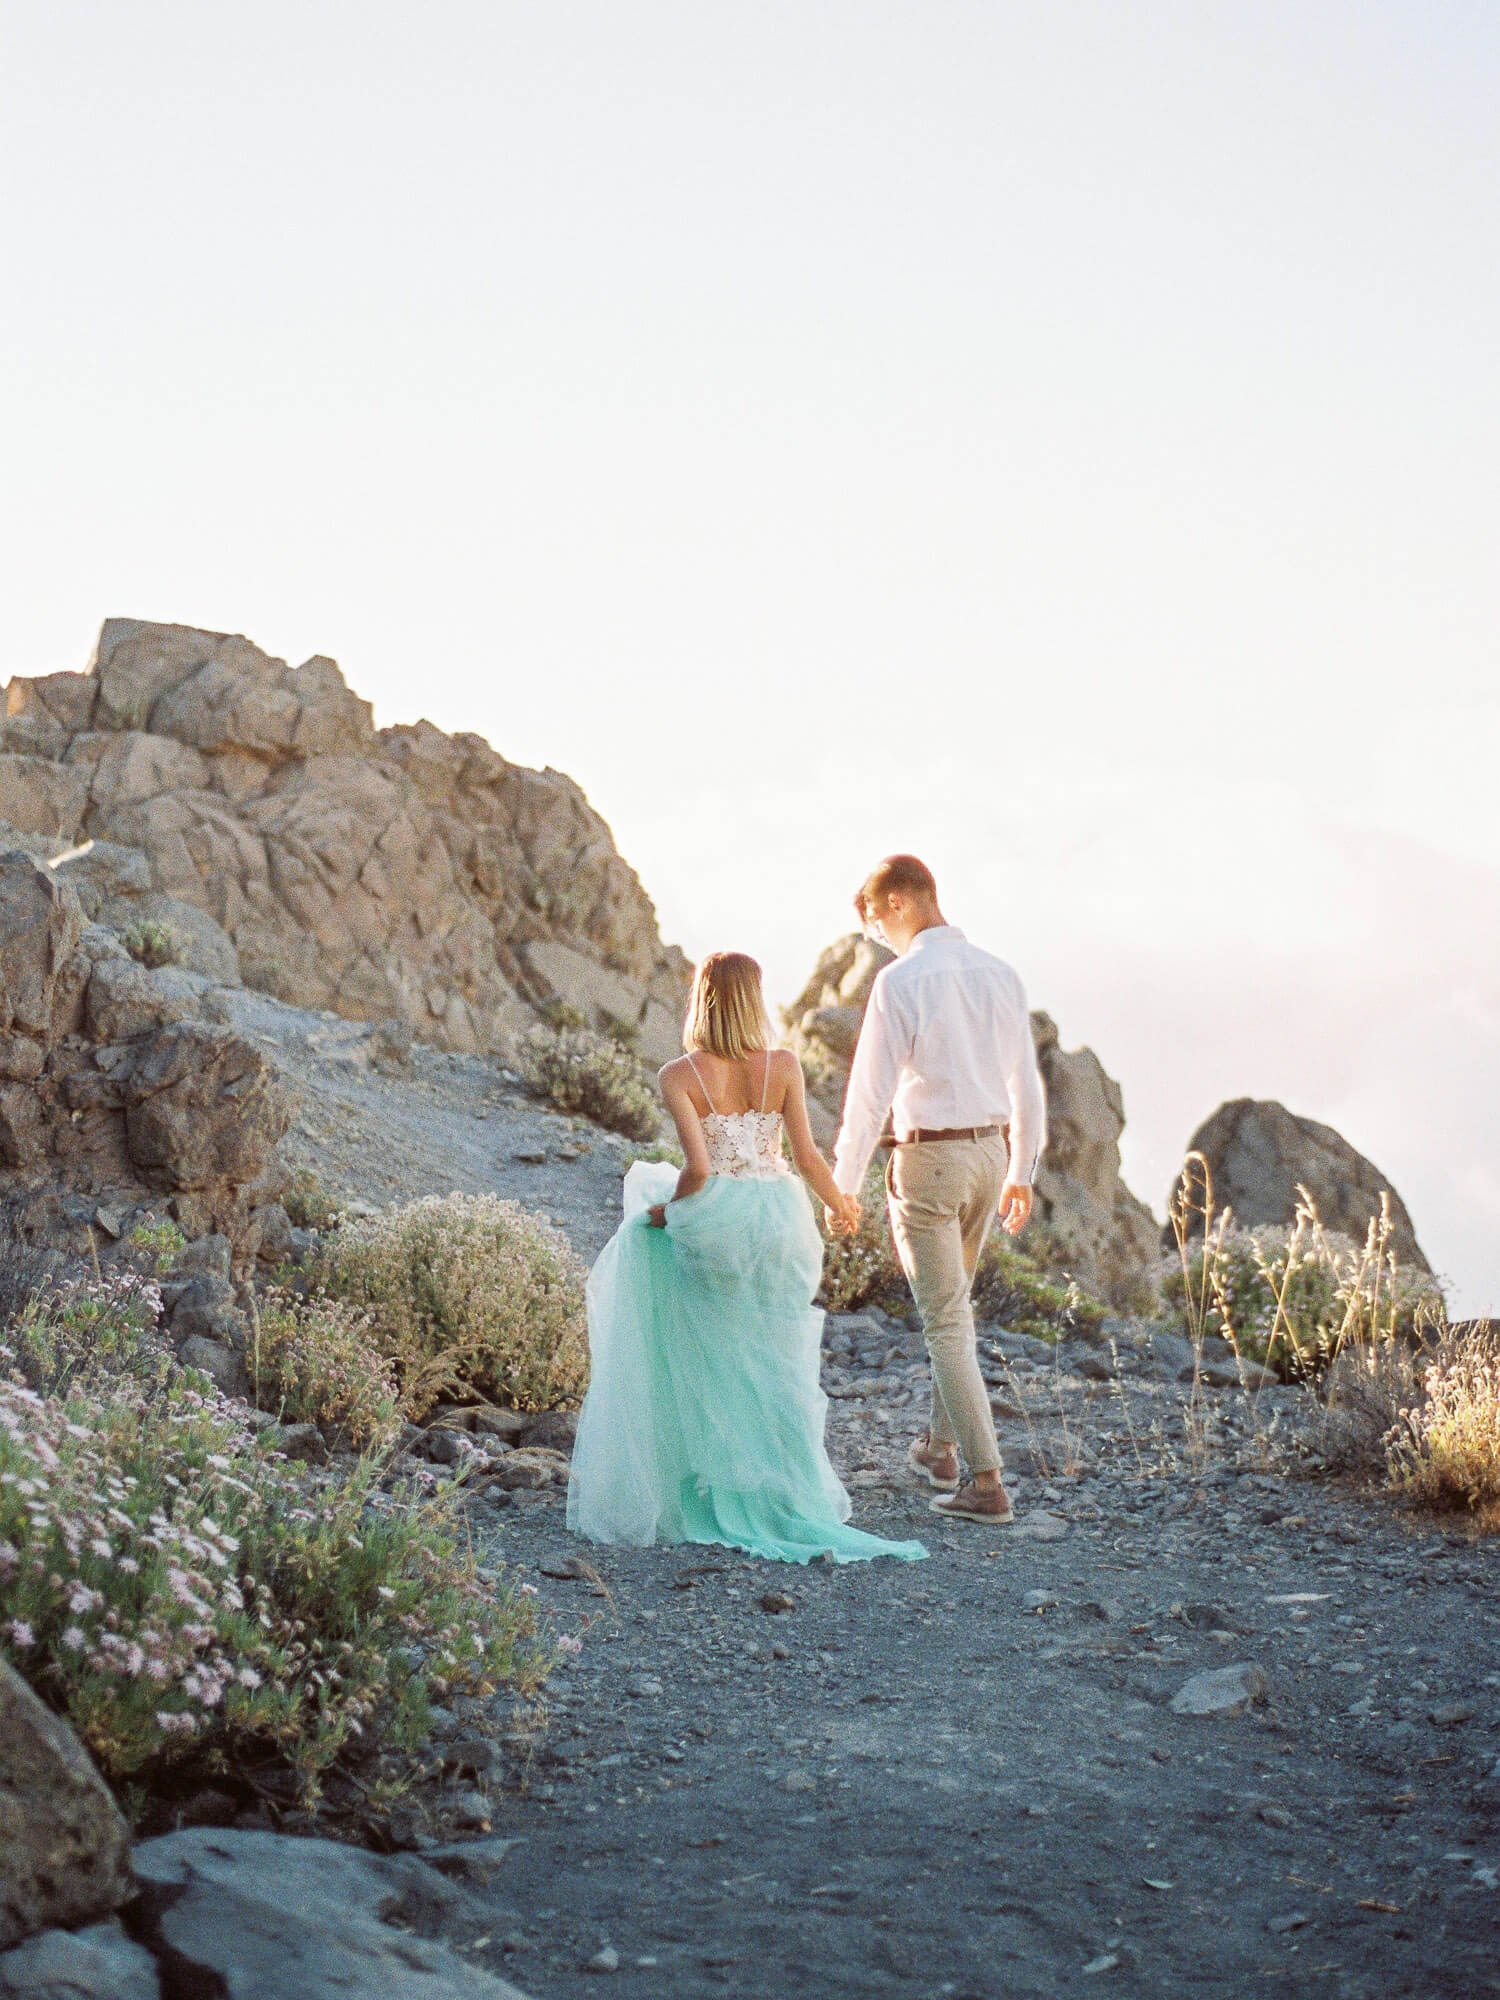 romantic film photo session near volcano Teide in Tenerife Canary Islands Spain